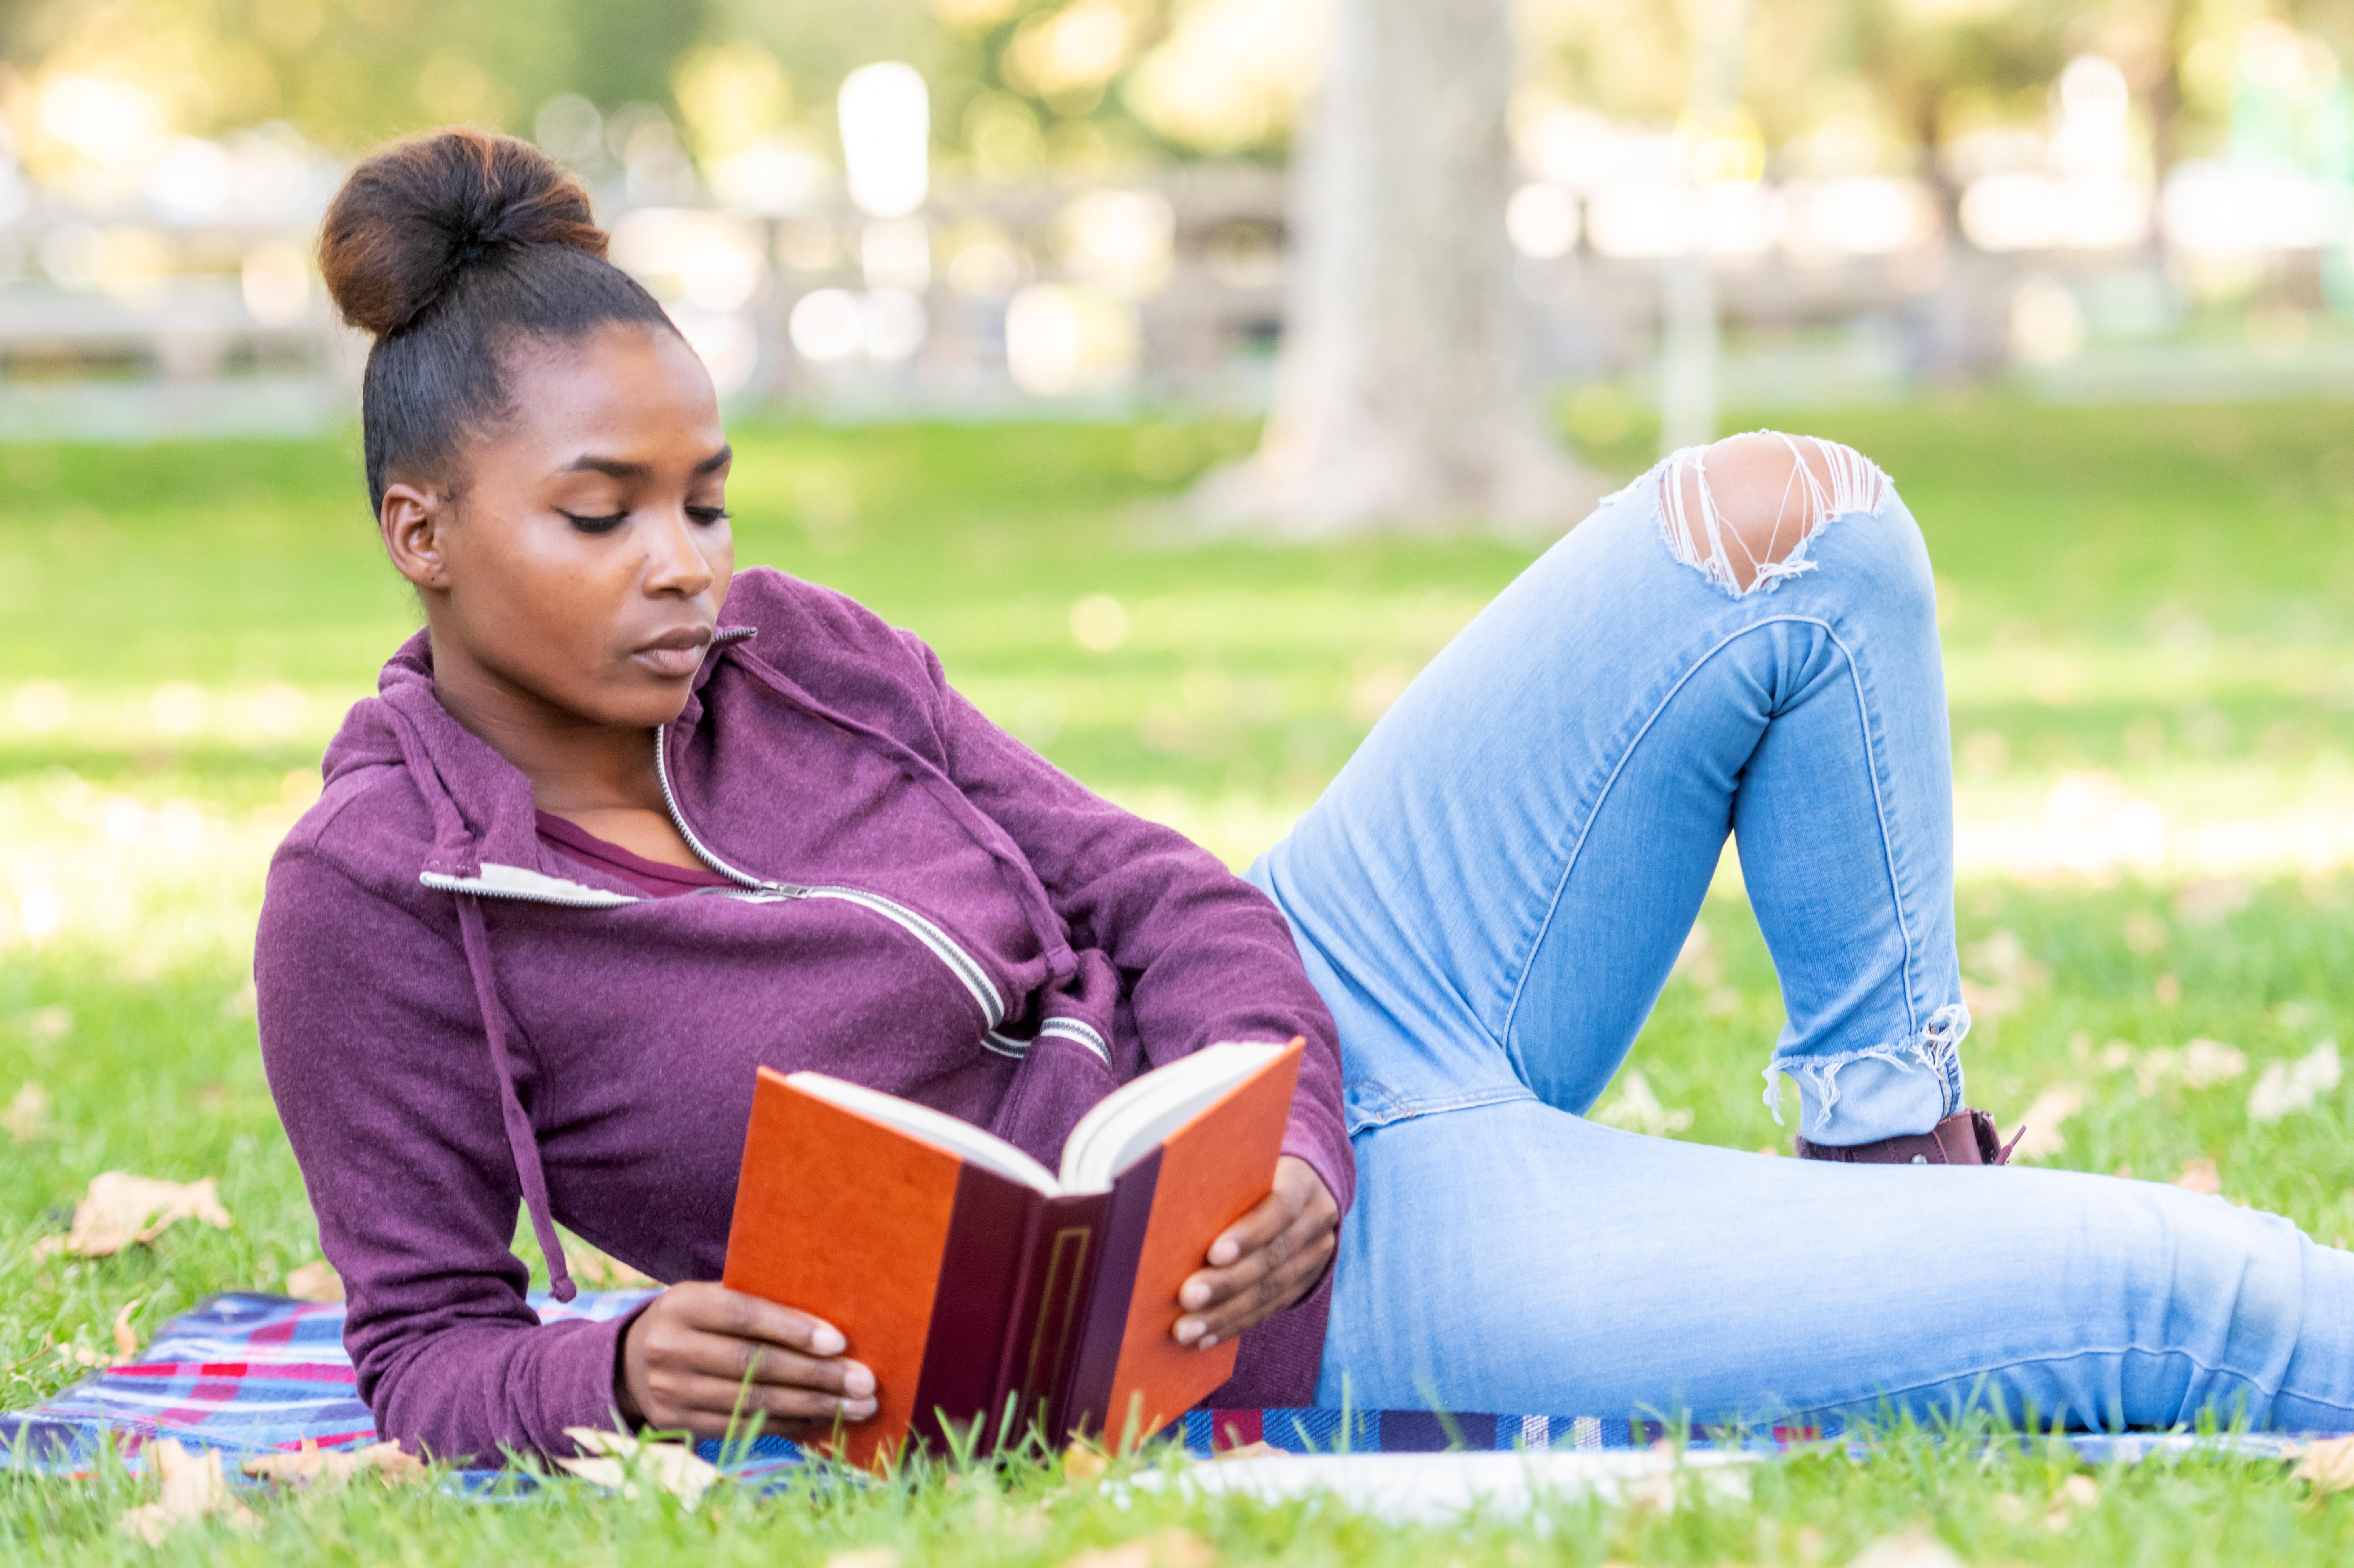 Serious beautiful young black woman